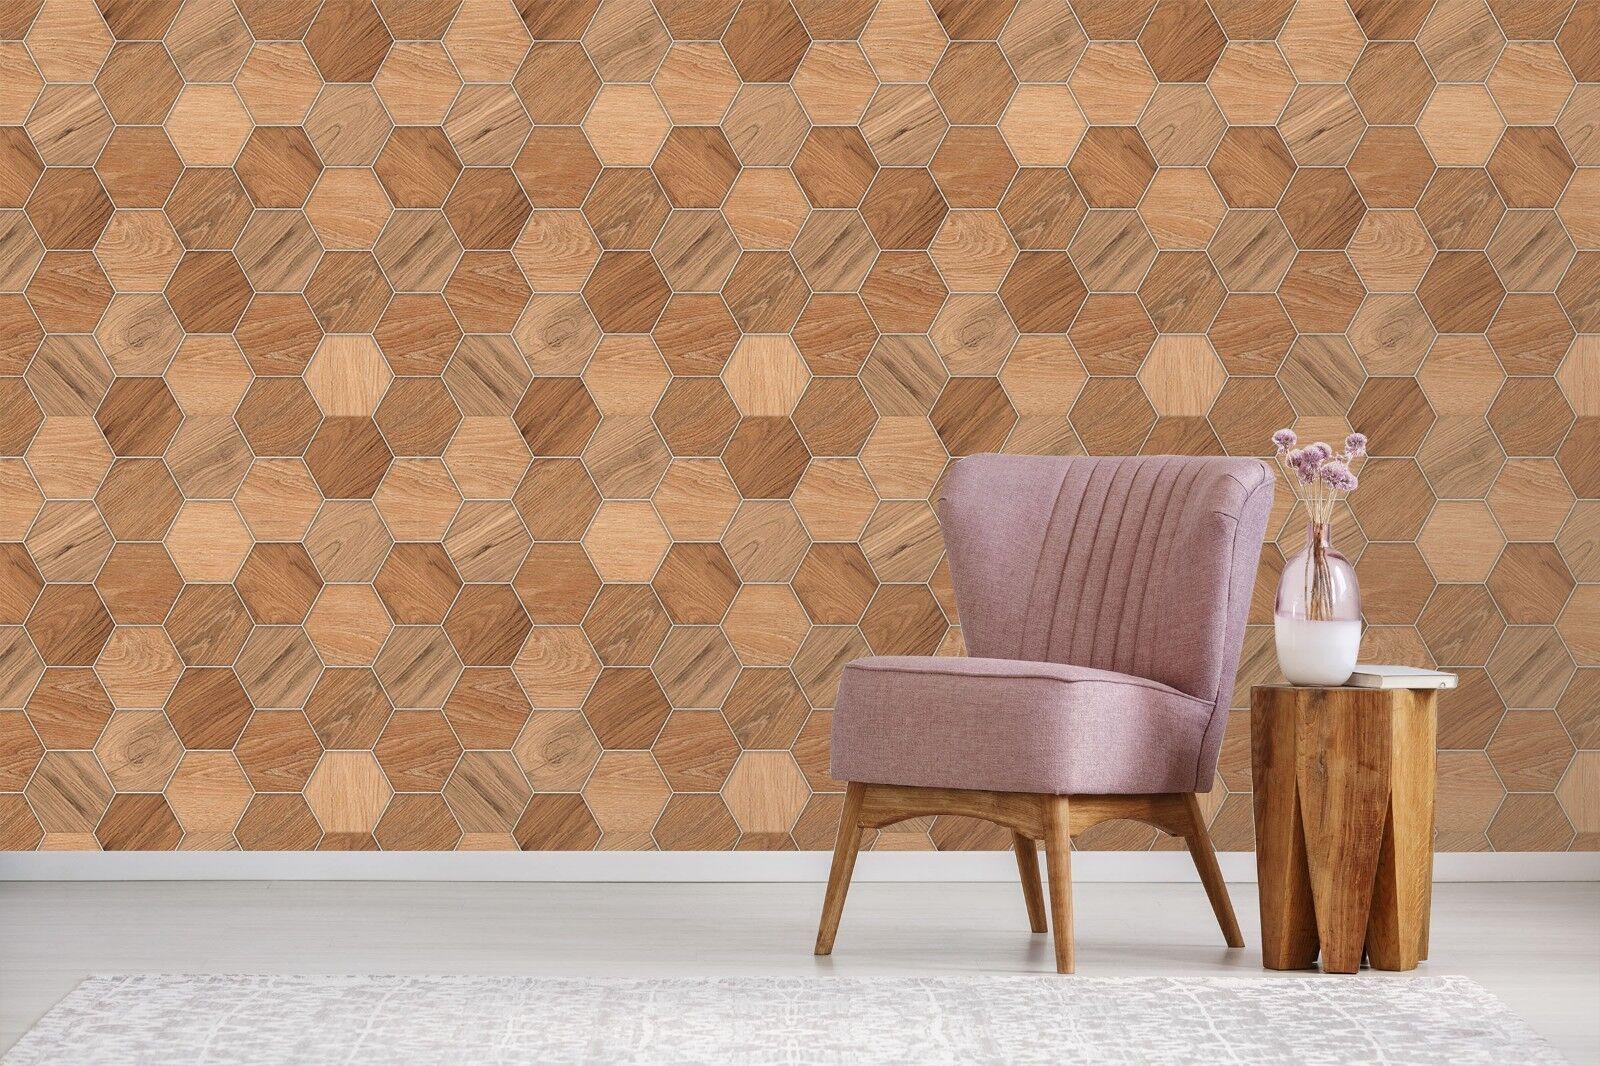 D esagono legno brett texture texture texture piastrelle marmo